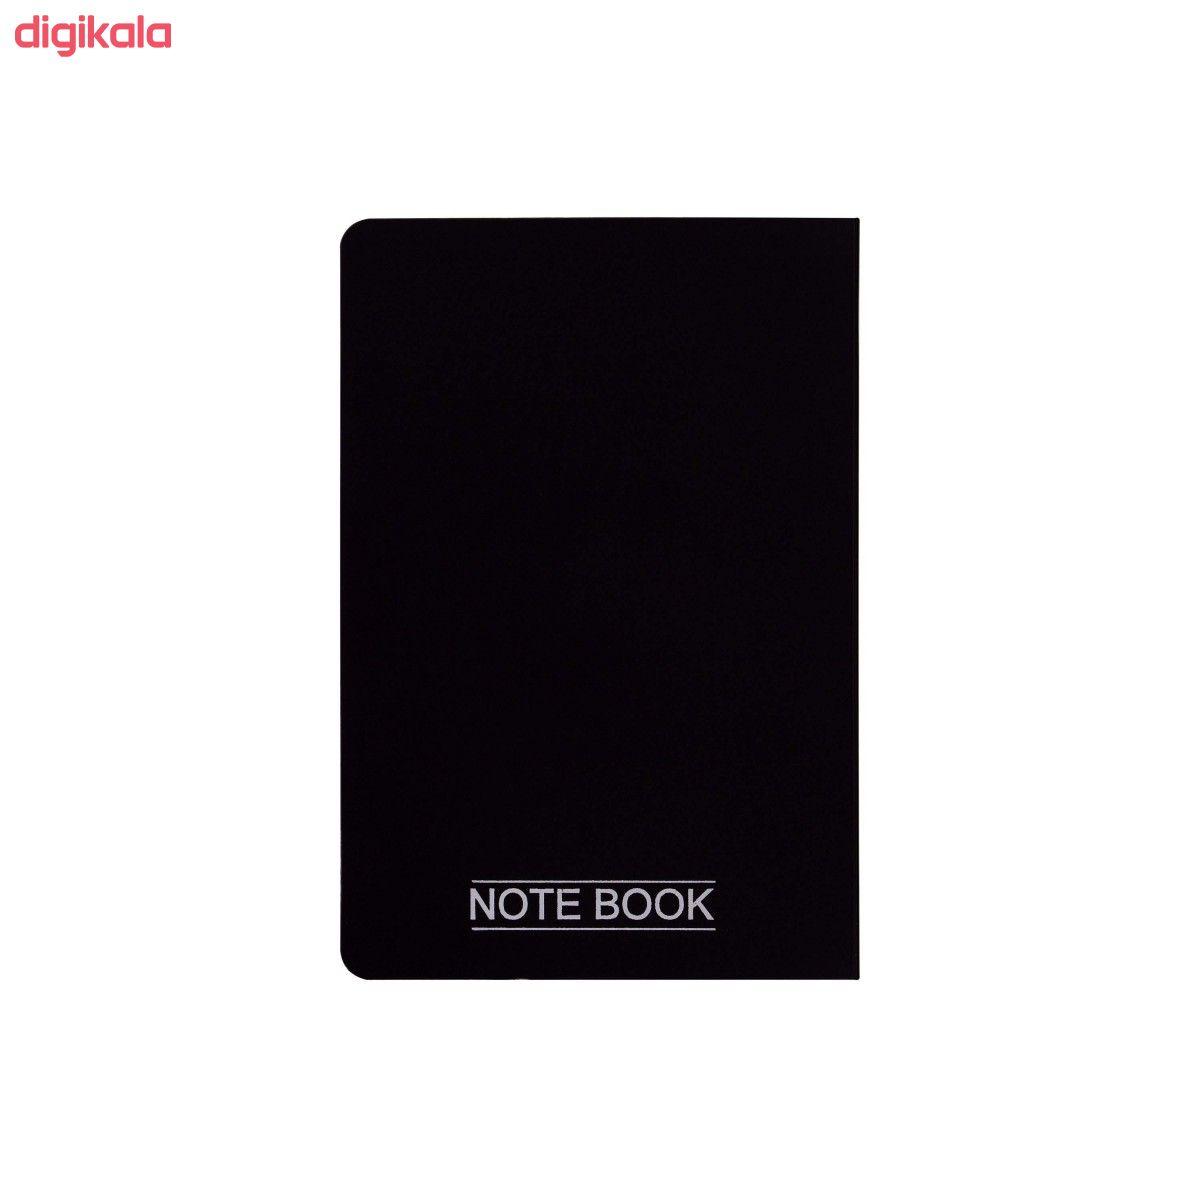 دفتر یادداشت 120 برگ پاپکو مدل  NB-638 کد HT01 main 1 8